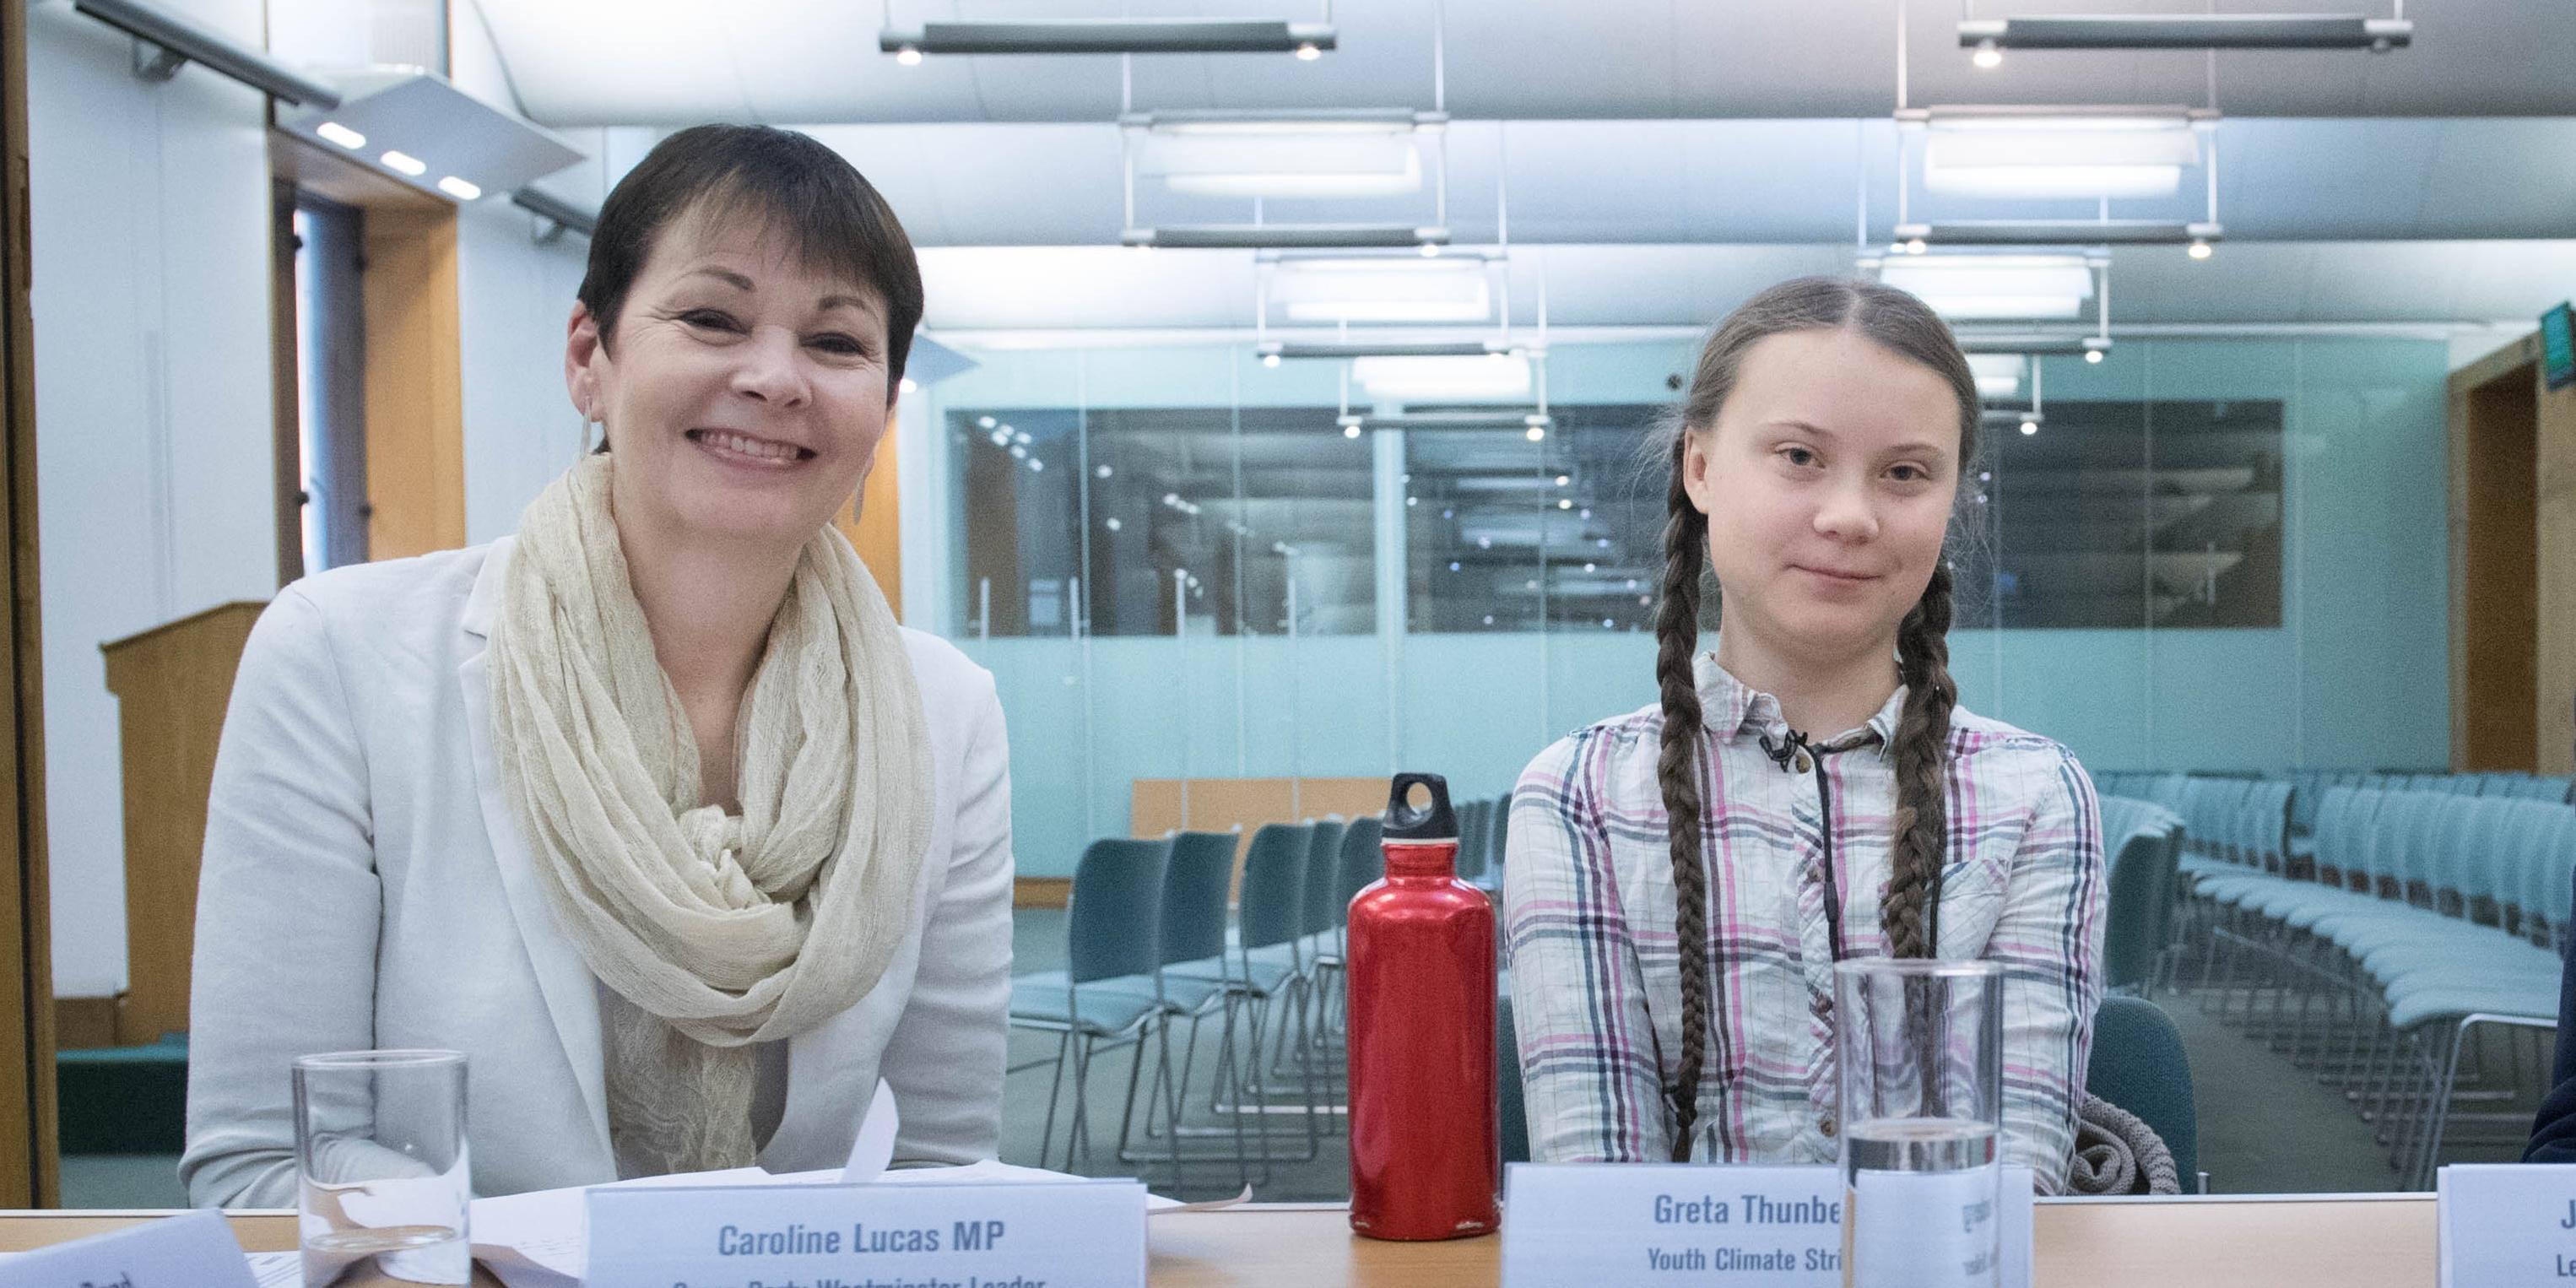 Swedish climate activist Greta Thunberg meets Caroline Lucas on 23rd April 2019 in Westminster